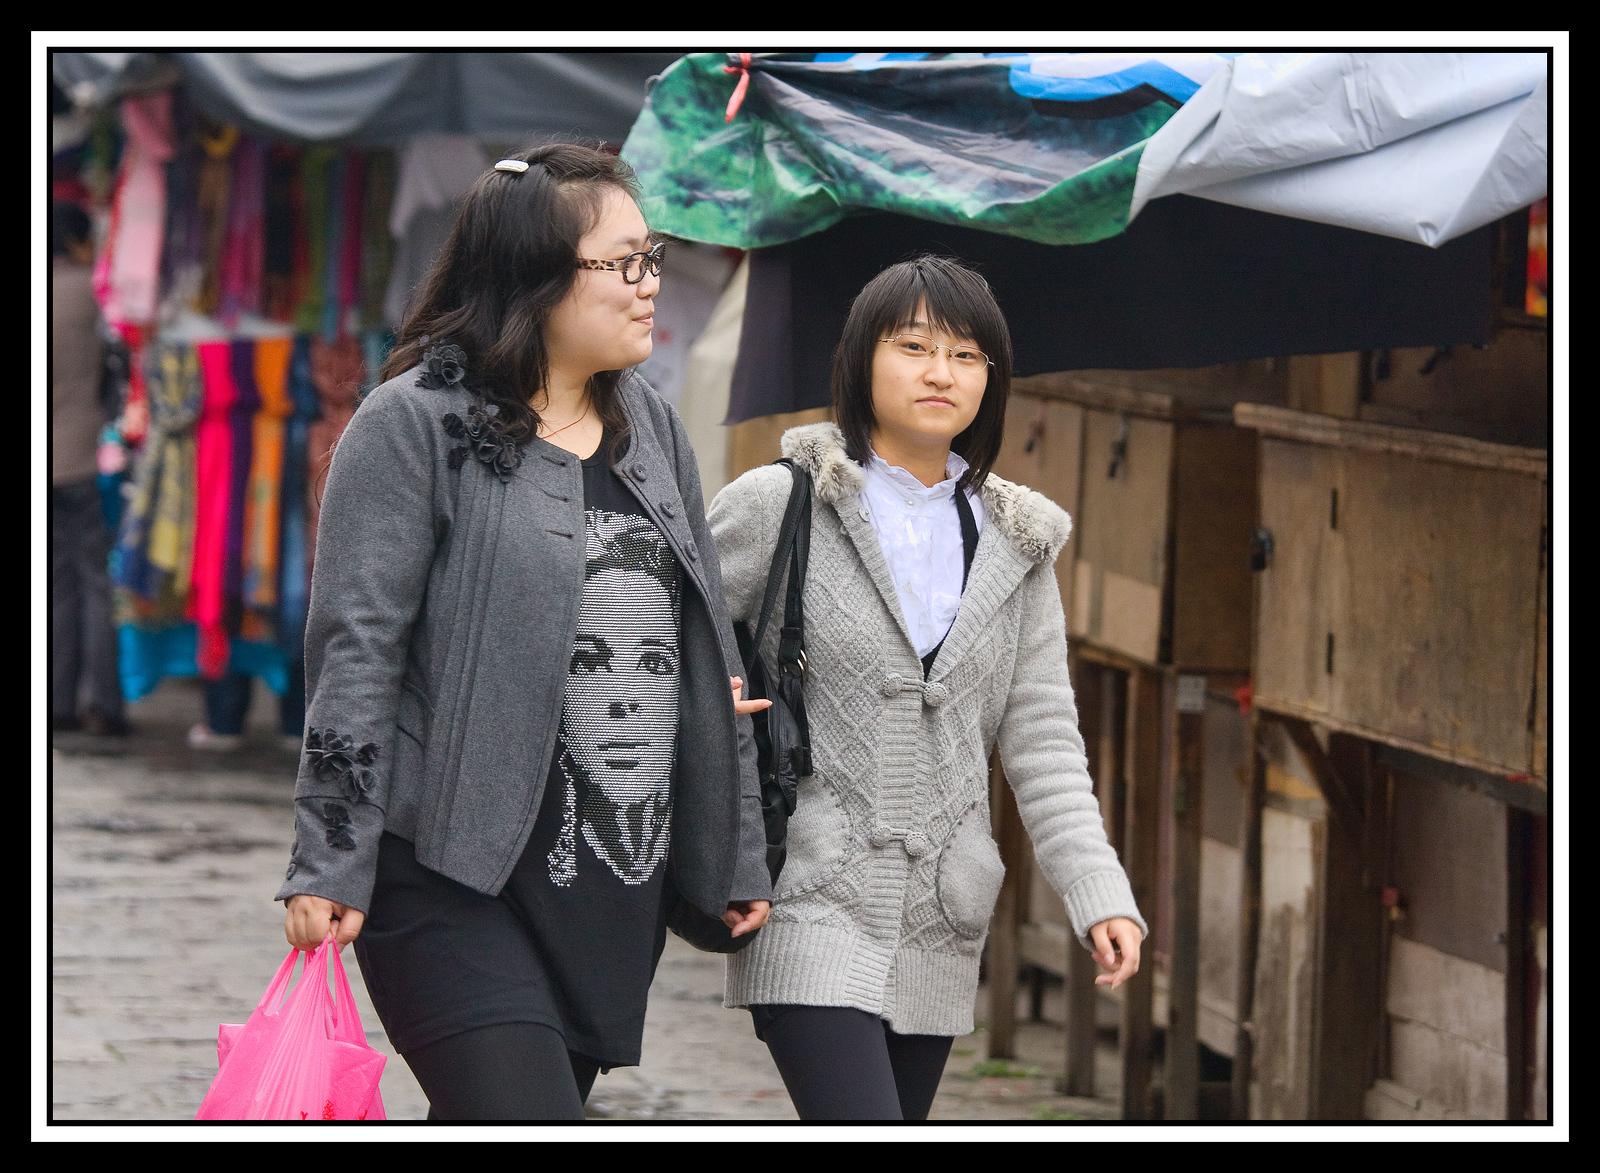 IMAGE: https://photos.smugmug.com/Travel/CHINA-FOCUS-TOUR-2010-GUILIN/i-JPQHLBB/0/402e429b/X3/Guilin%20-%20Two%20%20girls%20walking-X3.jpg